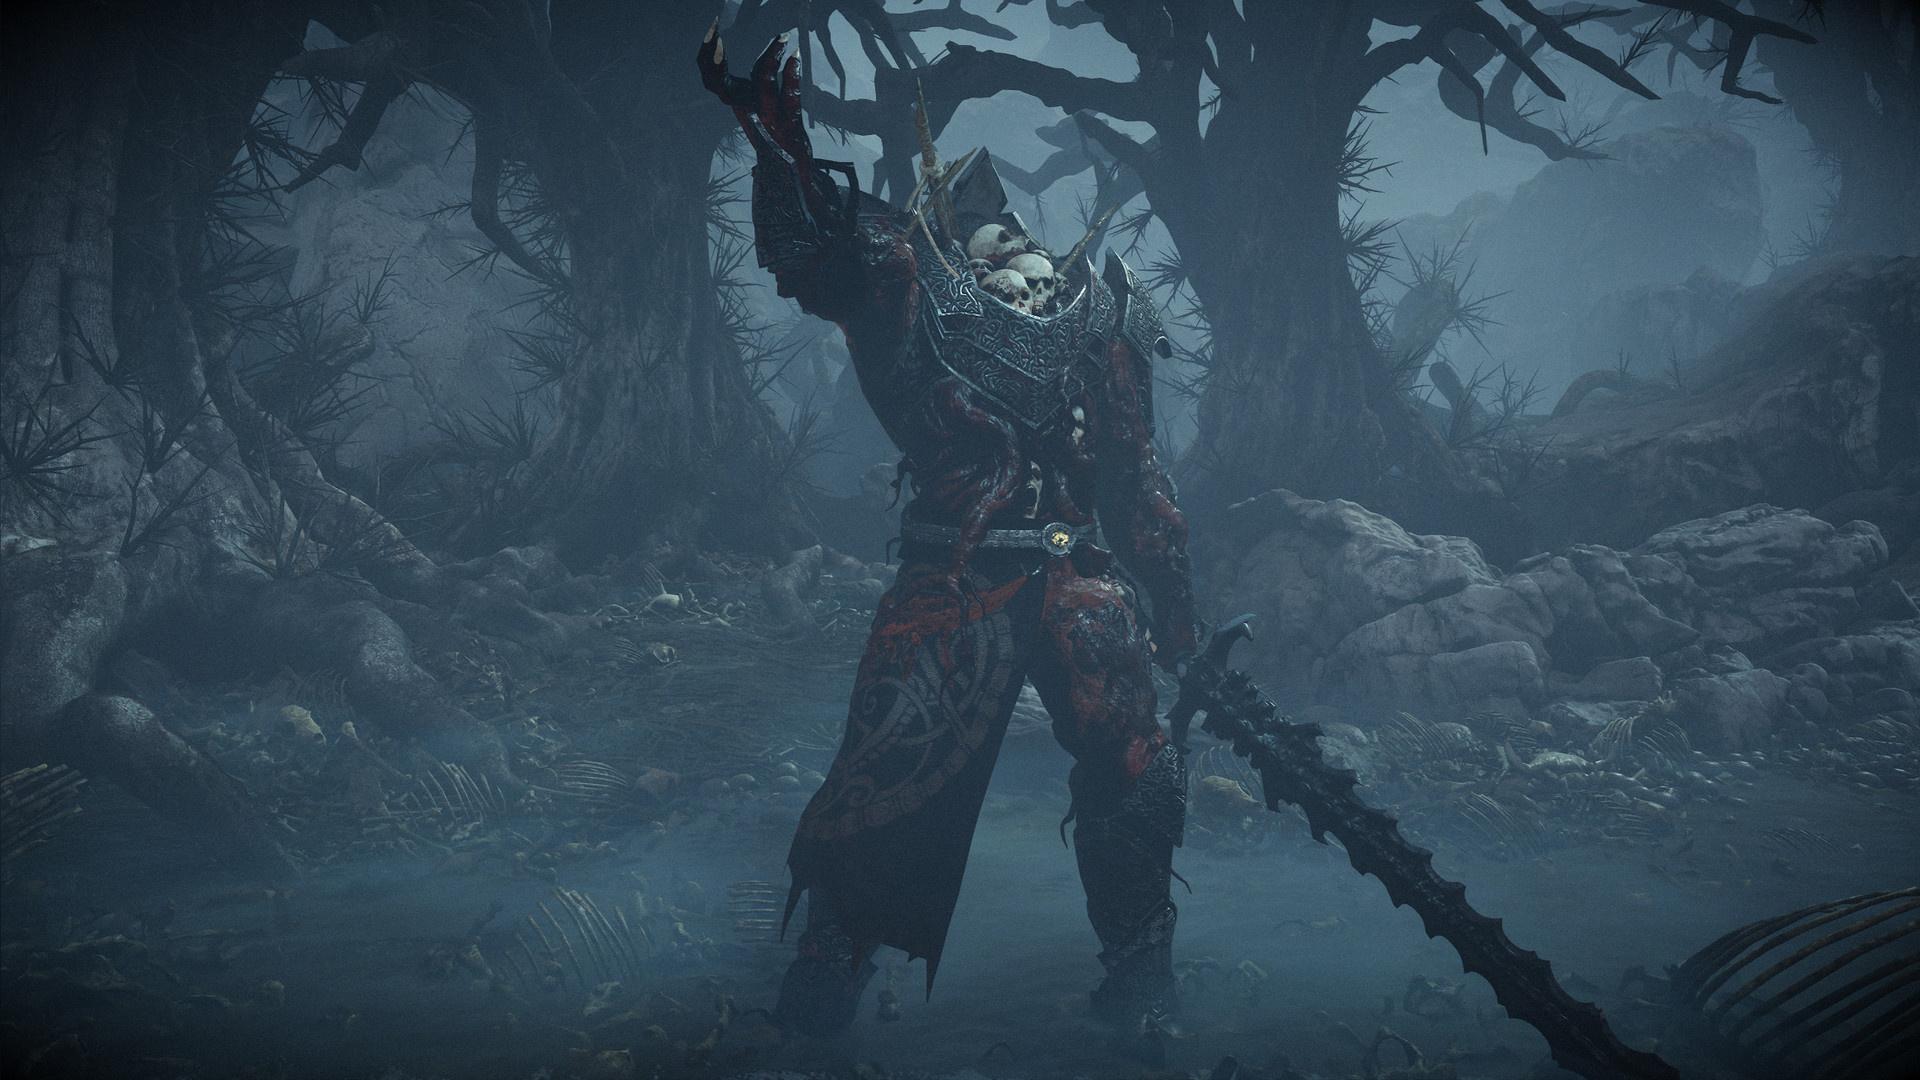 Тёмное фэнтези King Arthur: Knight's Tale вышло в раннем доступе Steam